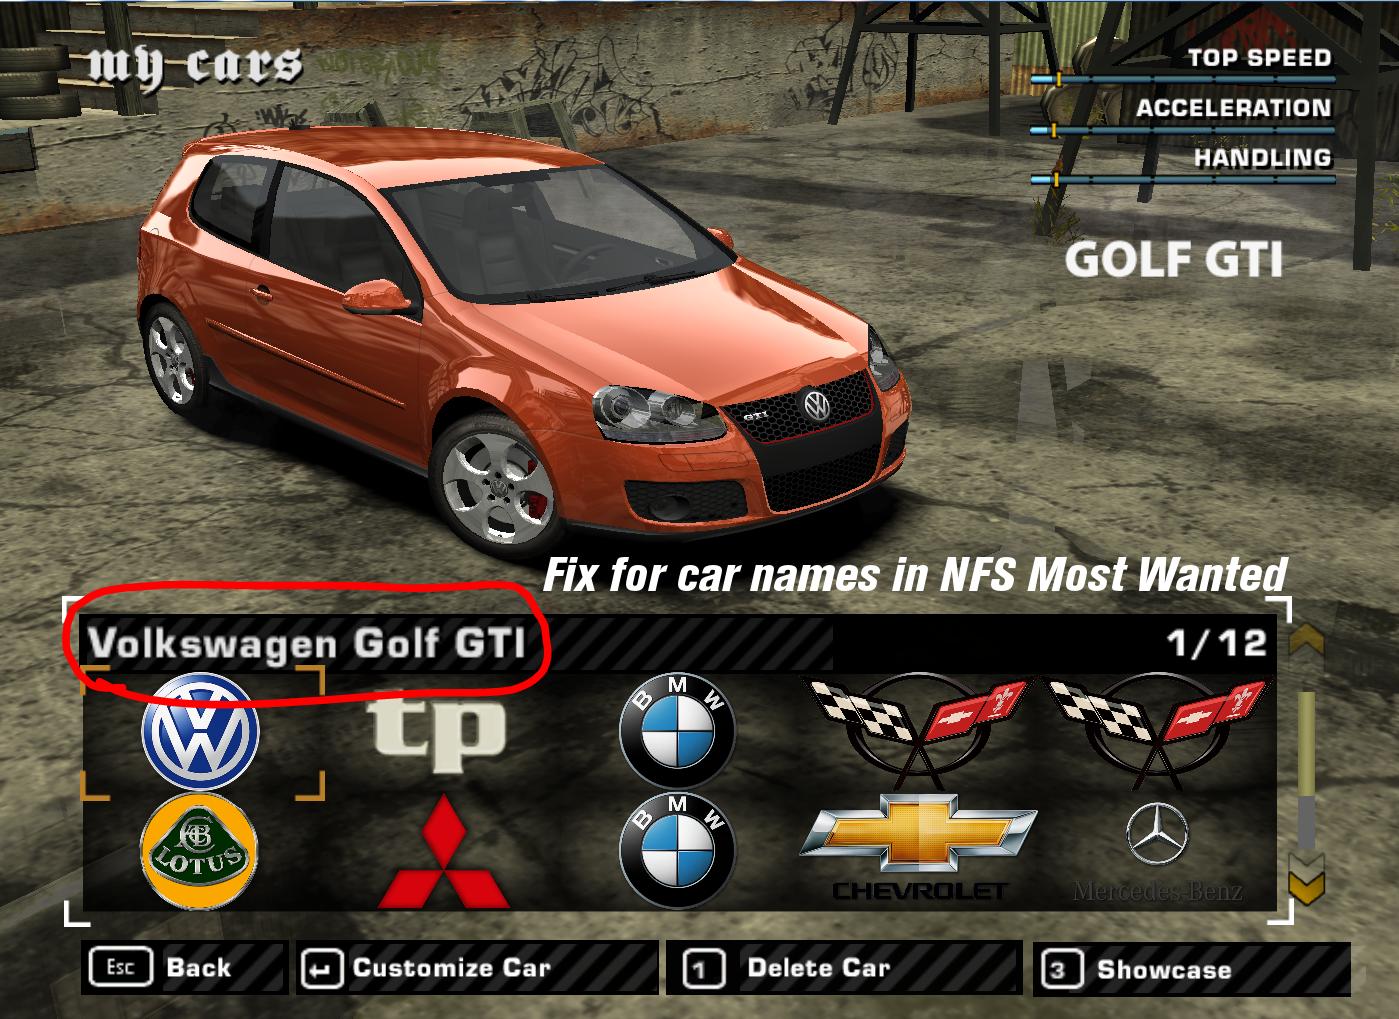 Nfsmods Nfs Most Wanted Car Name Fixes Bonuses